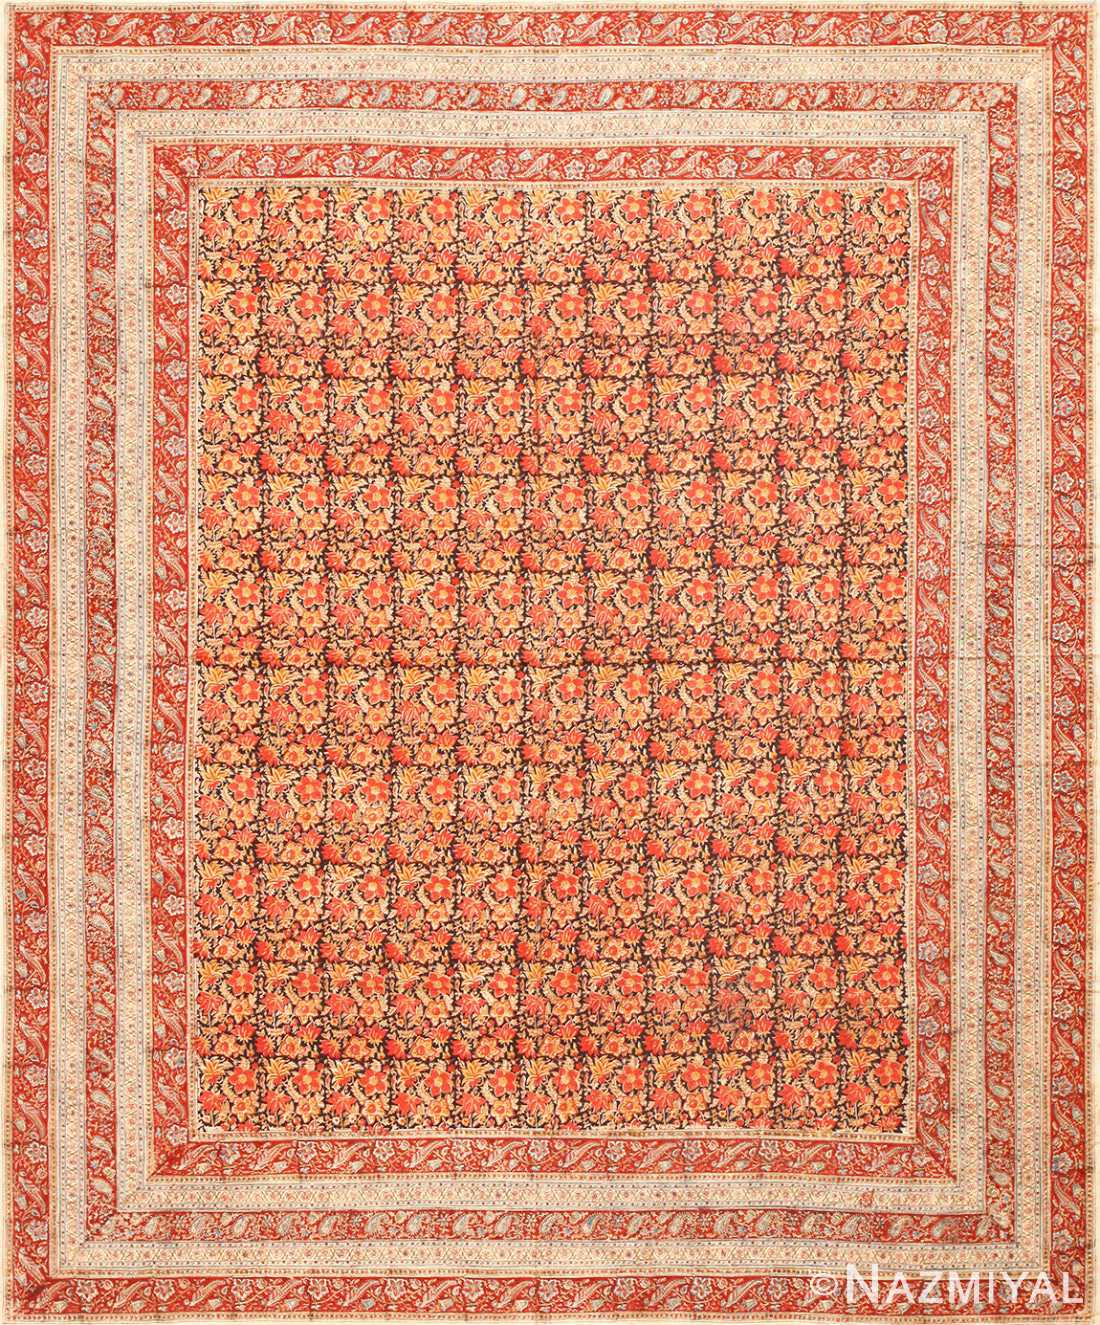 Antique Persian Floral Textile 48803 Nazmiyal